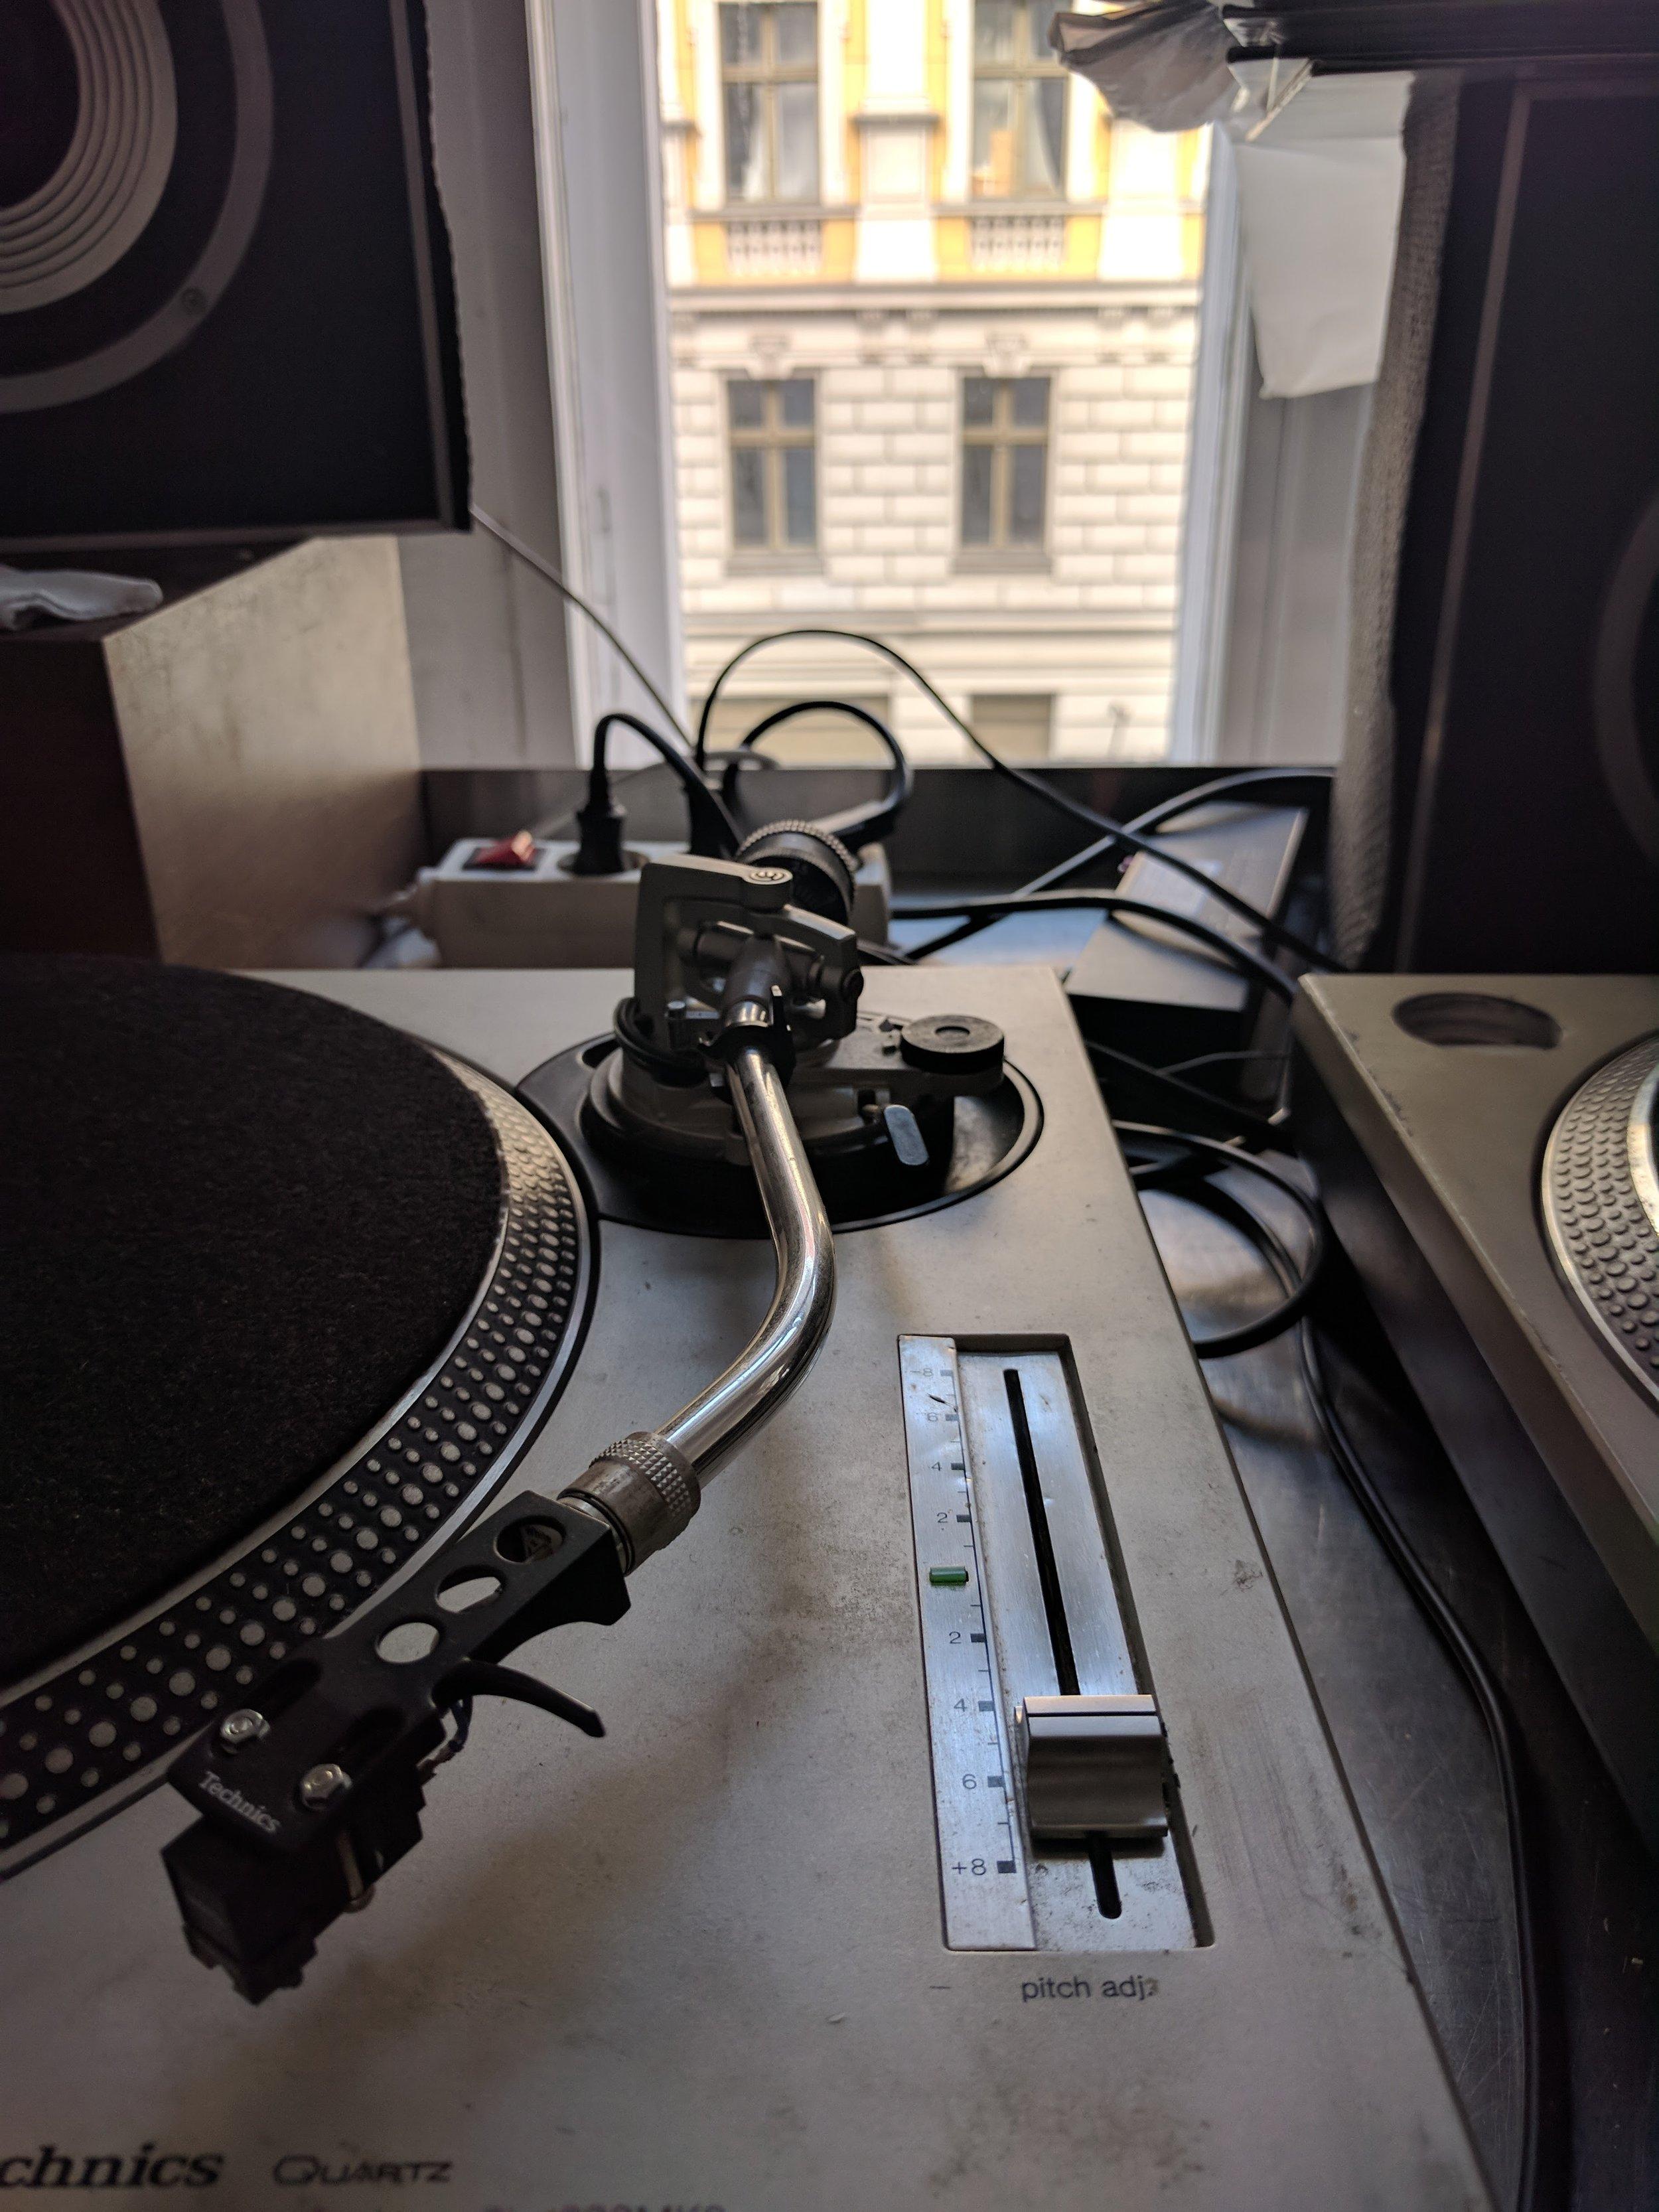 Record player photo 2.jpg